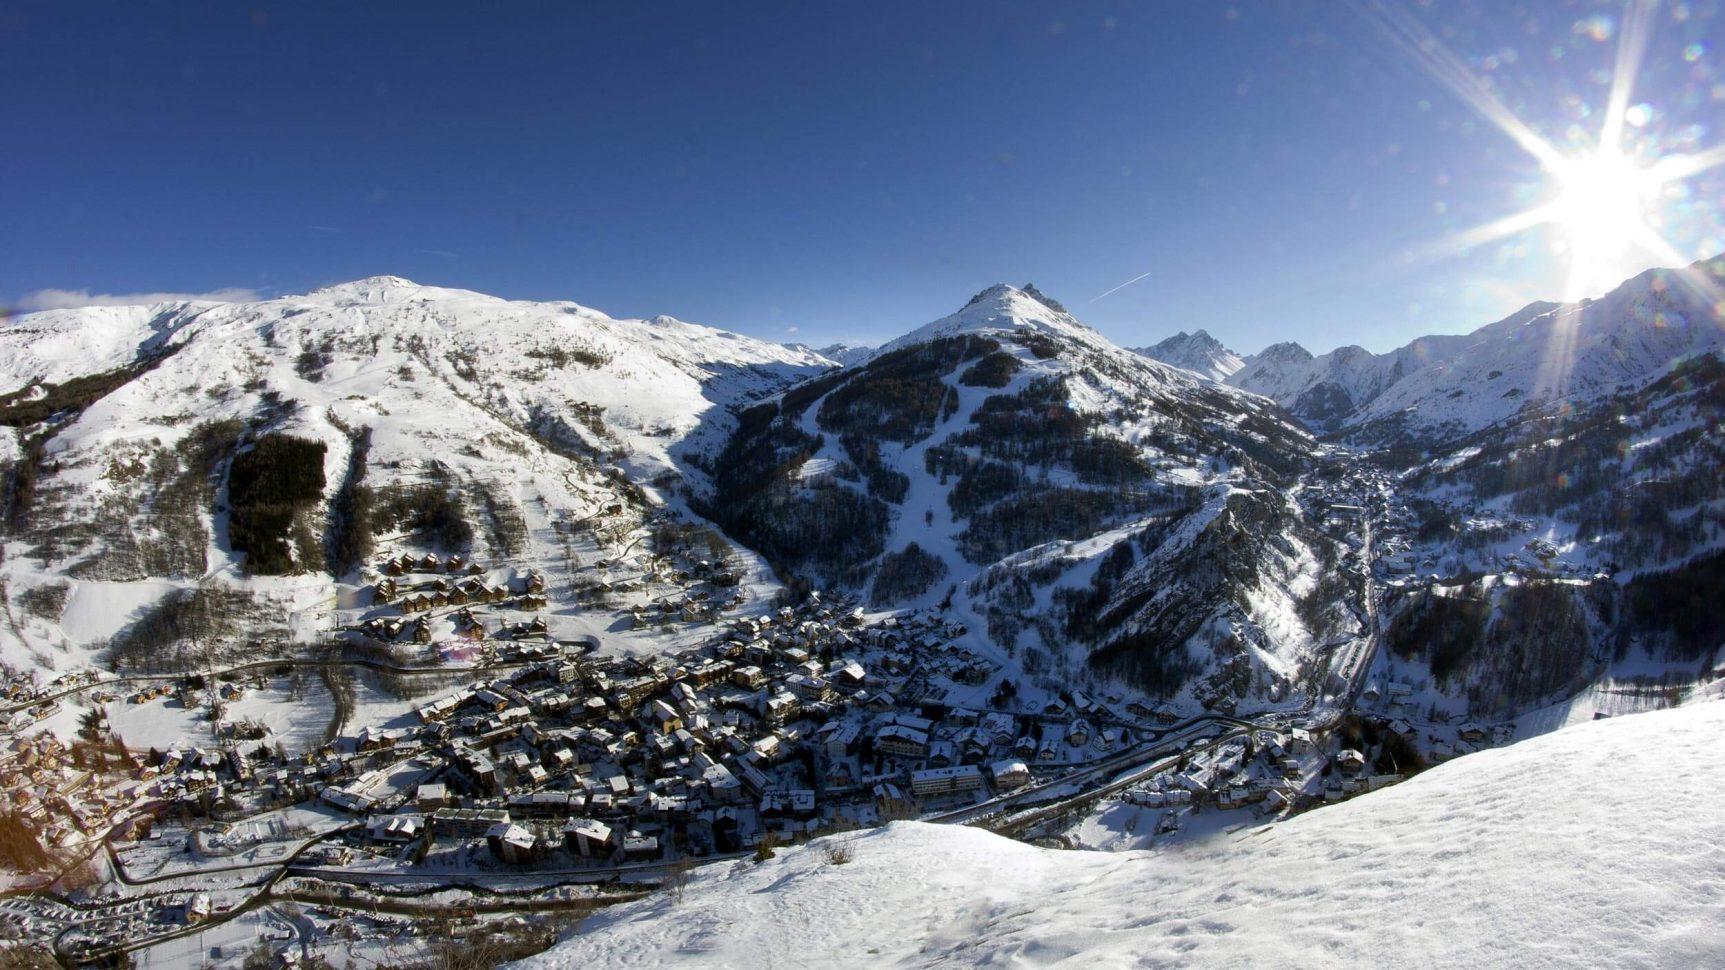 Valloire-Galibier, le village staion